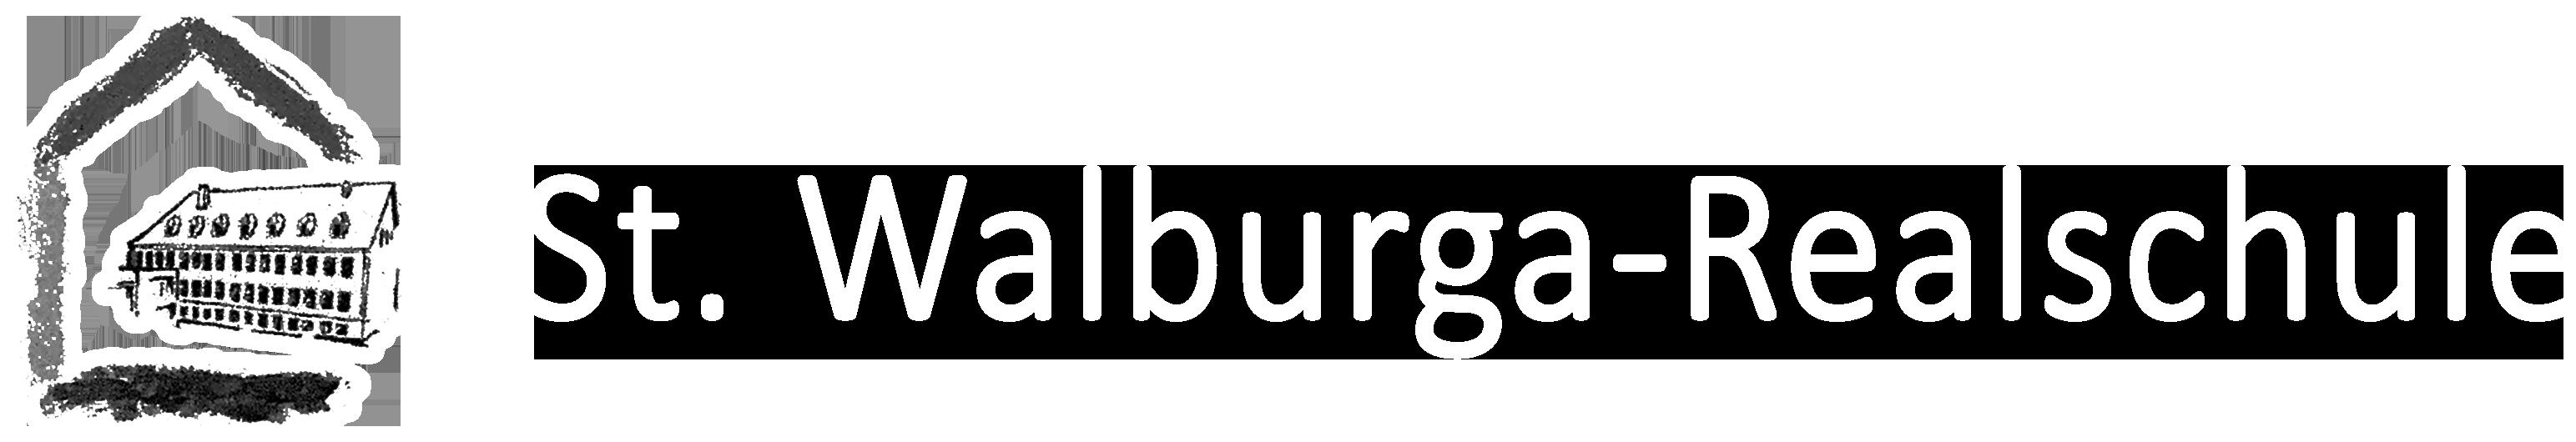 St. Walburga-Realschule